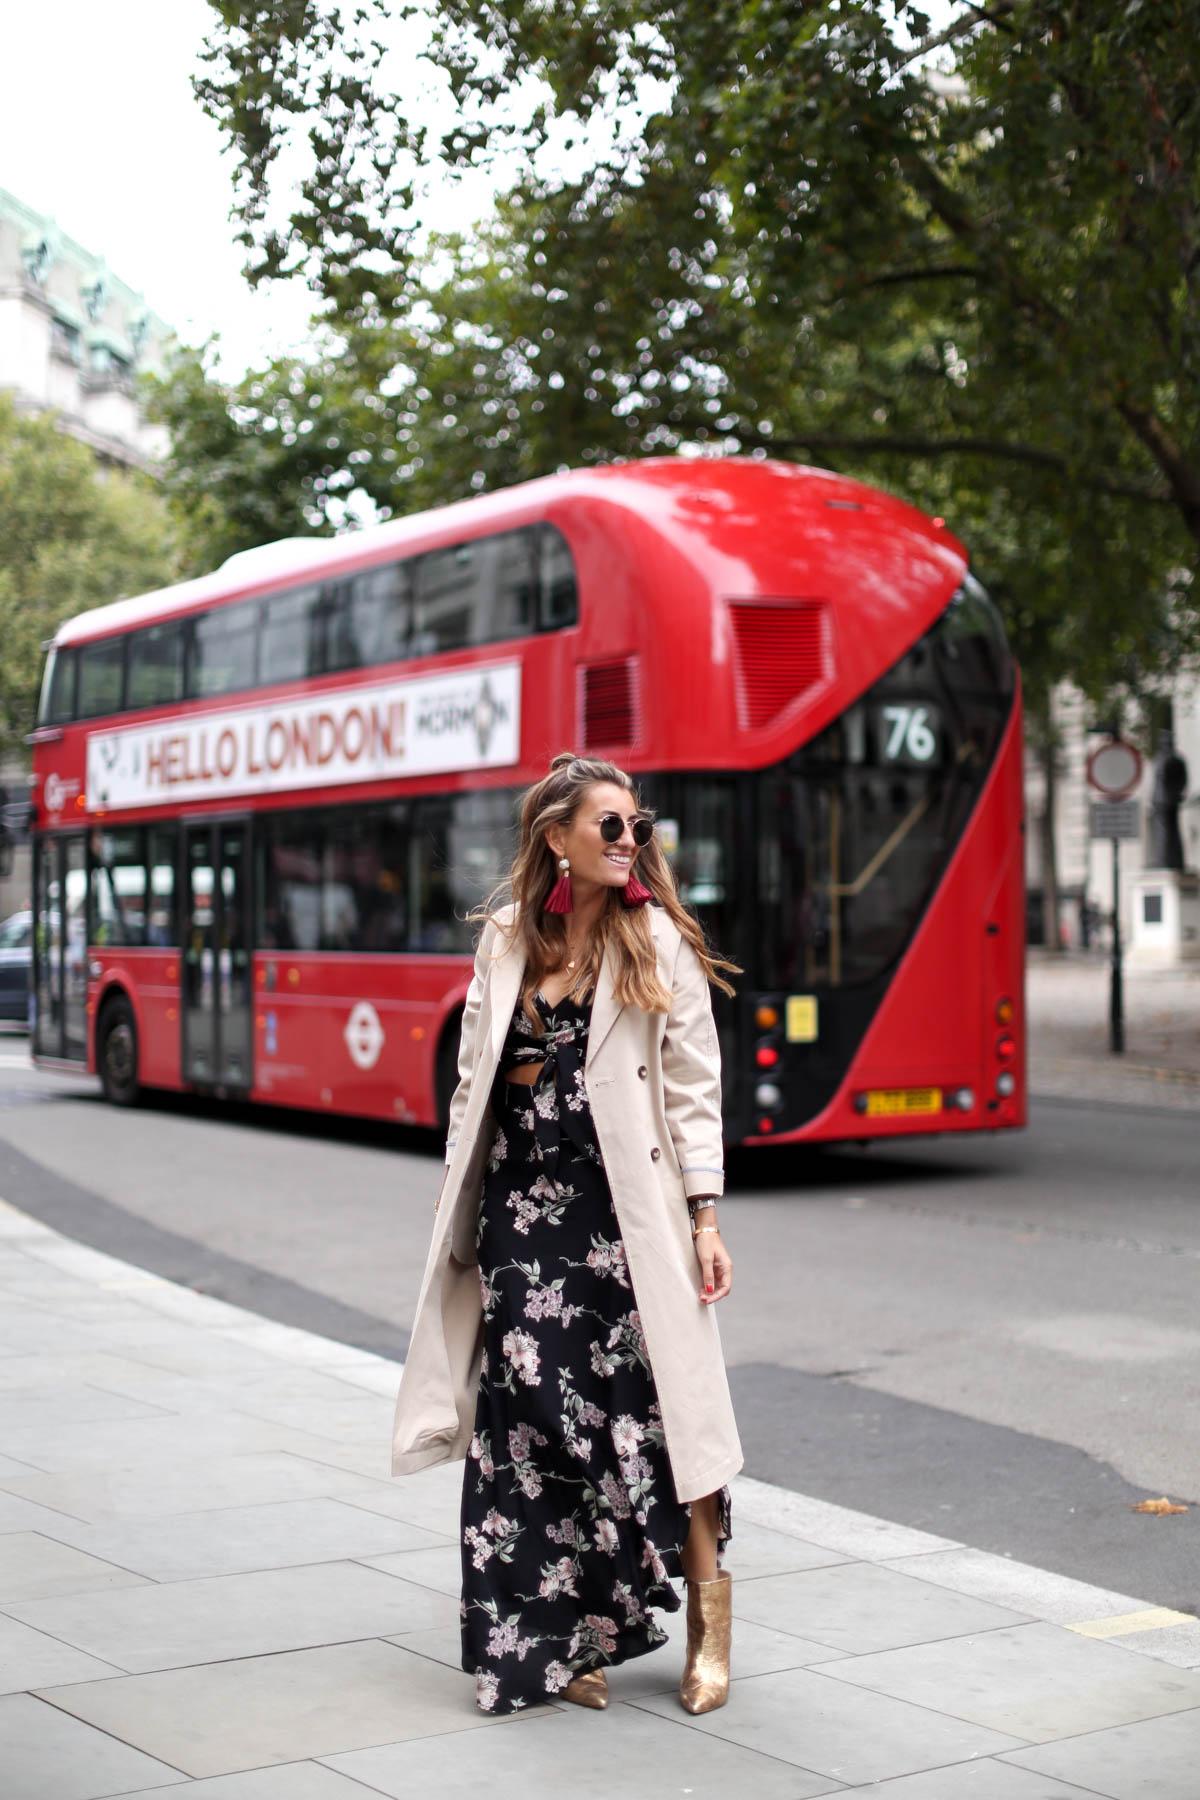 flynn-skye-trench-gabardinal-chloe-lfw-emiliodelamorena-londres-london-gucci-chanel-cateye-zara-levis-bartabac-bartabacmode-blog-blogger-fashion-streetstyle-moda-2